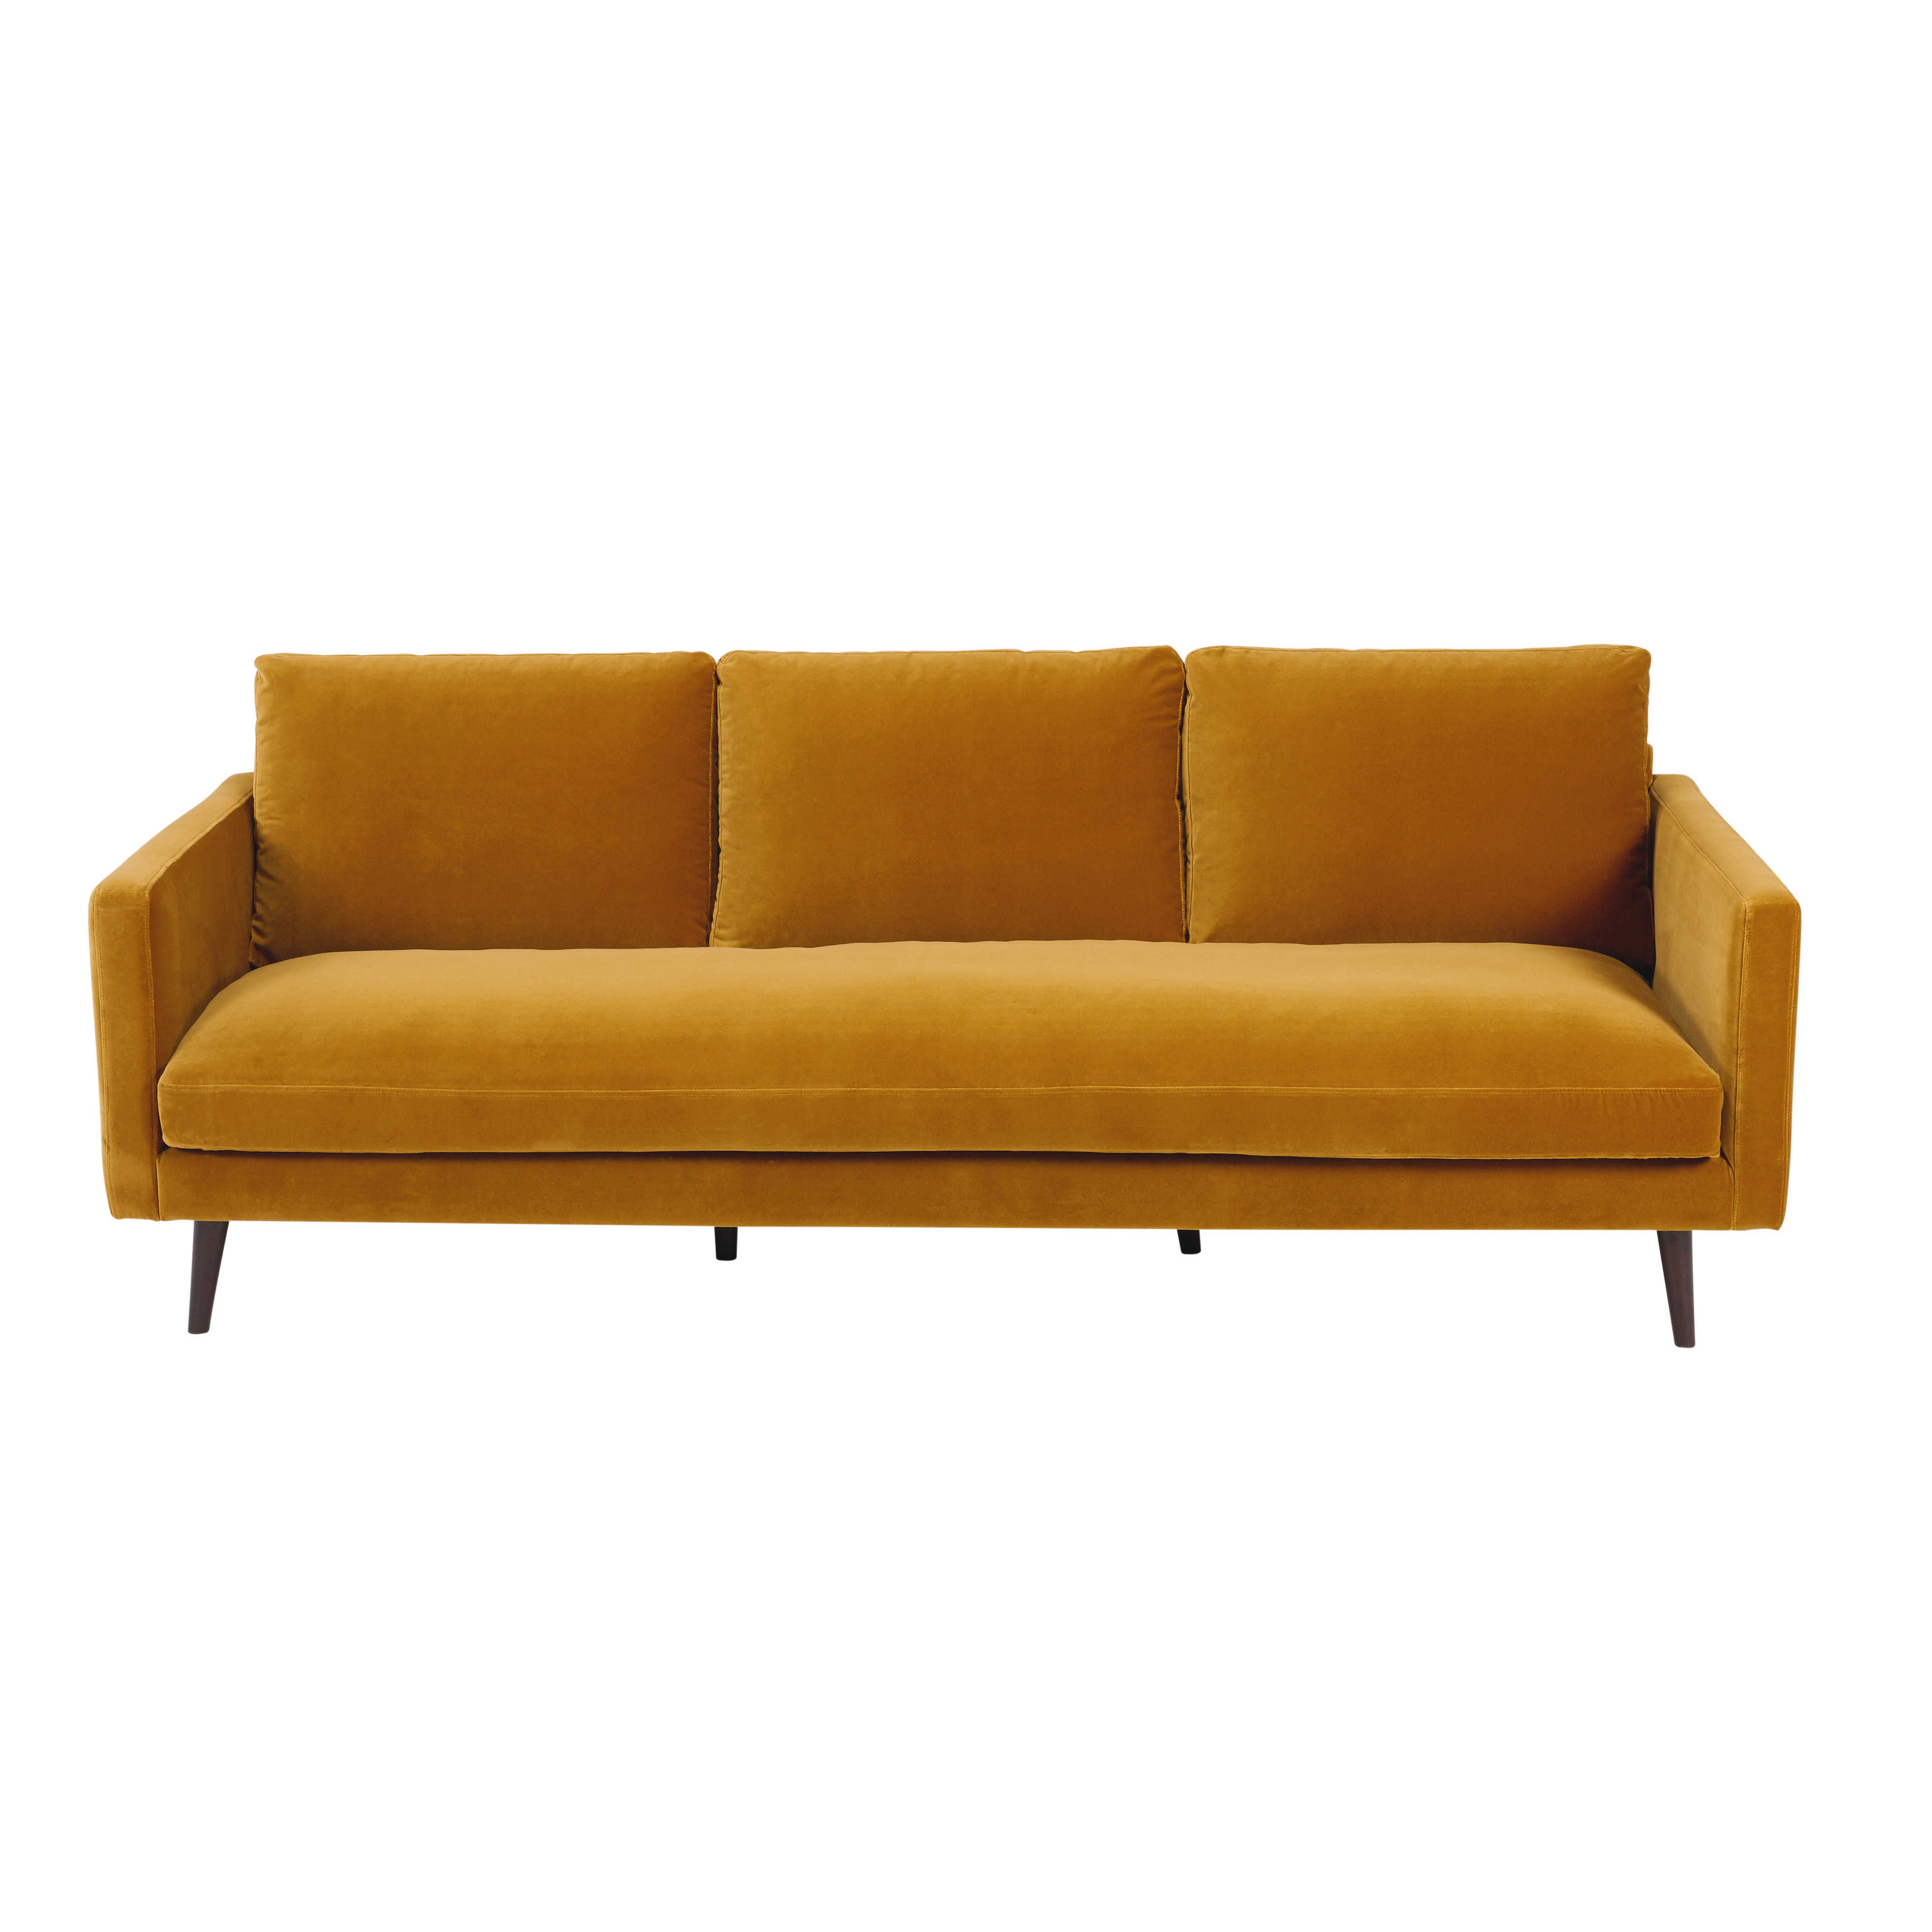 Canape 4 Places En Velours Jaune Moutarde Kant Samt Sofa Sofa Gelb Sofa Design